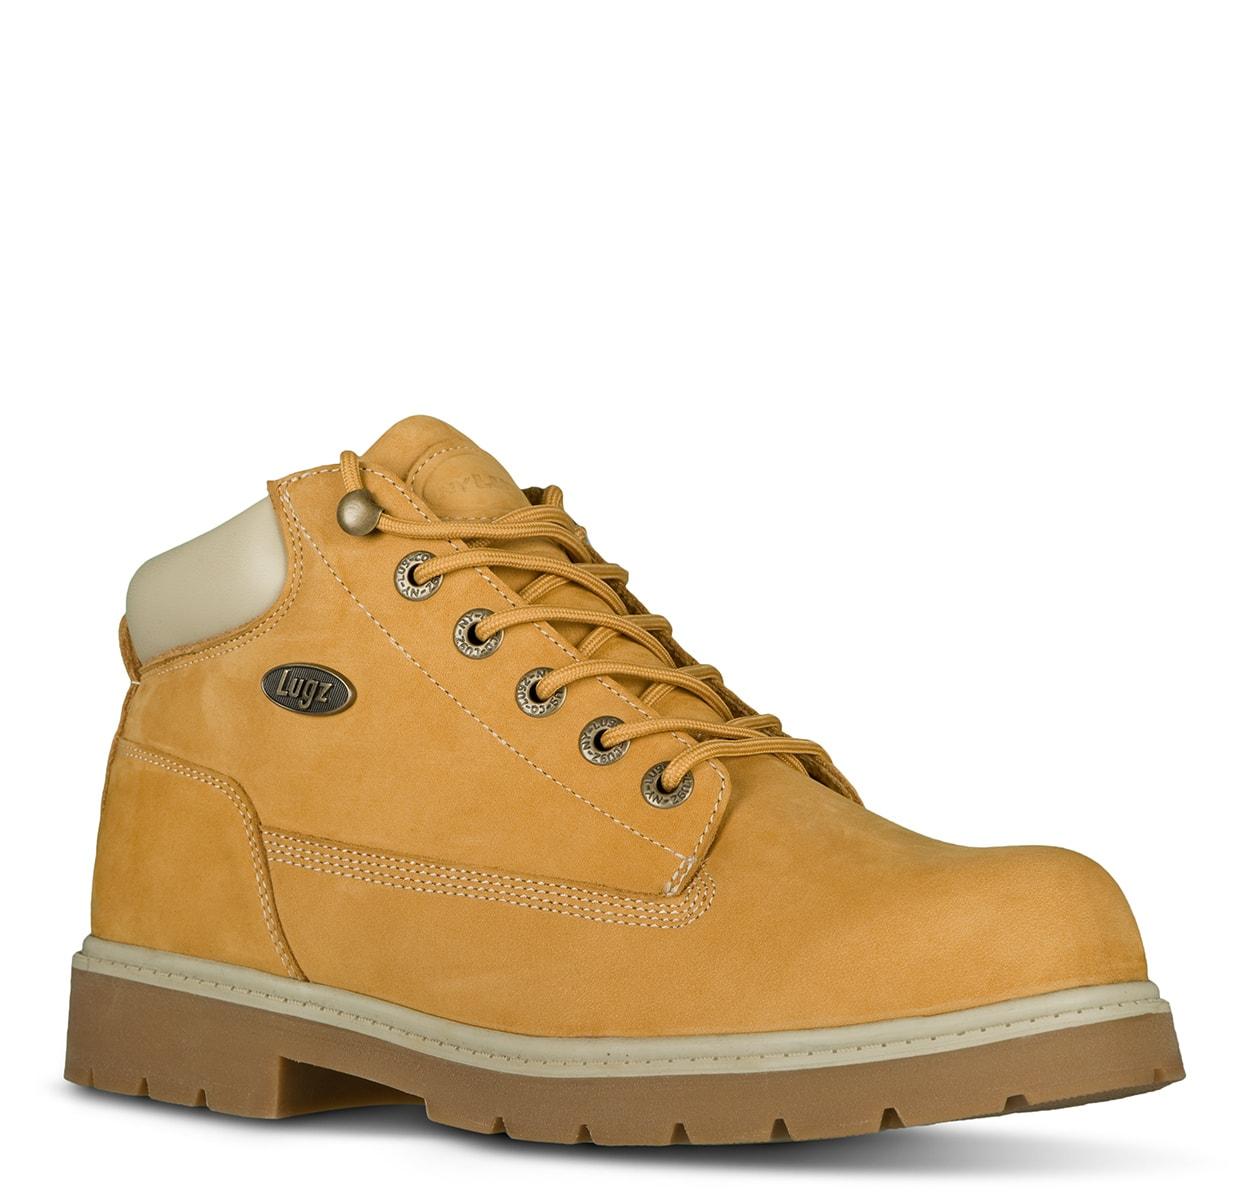 Men's Drifter Lx Chukka Boot (Choose Your Color: Golden Wheat/Cream/Gum, Choose Your Size: 10.5)